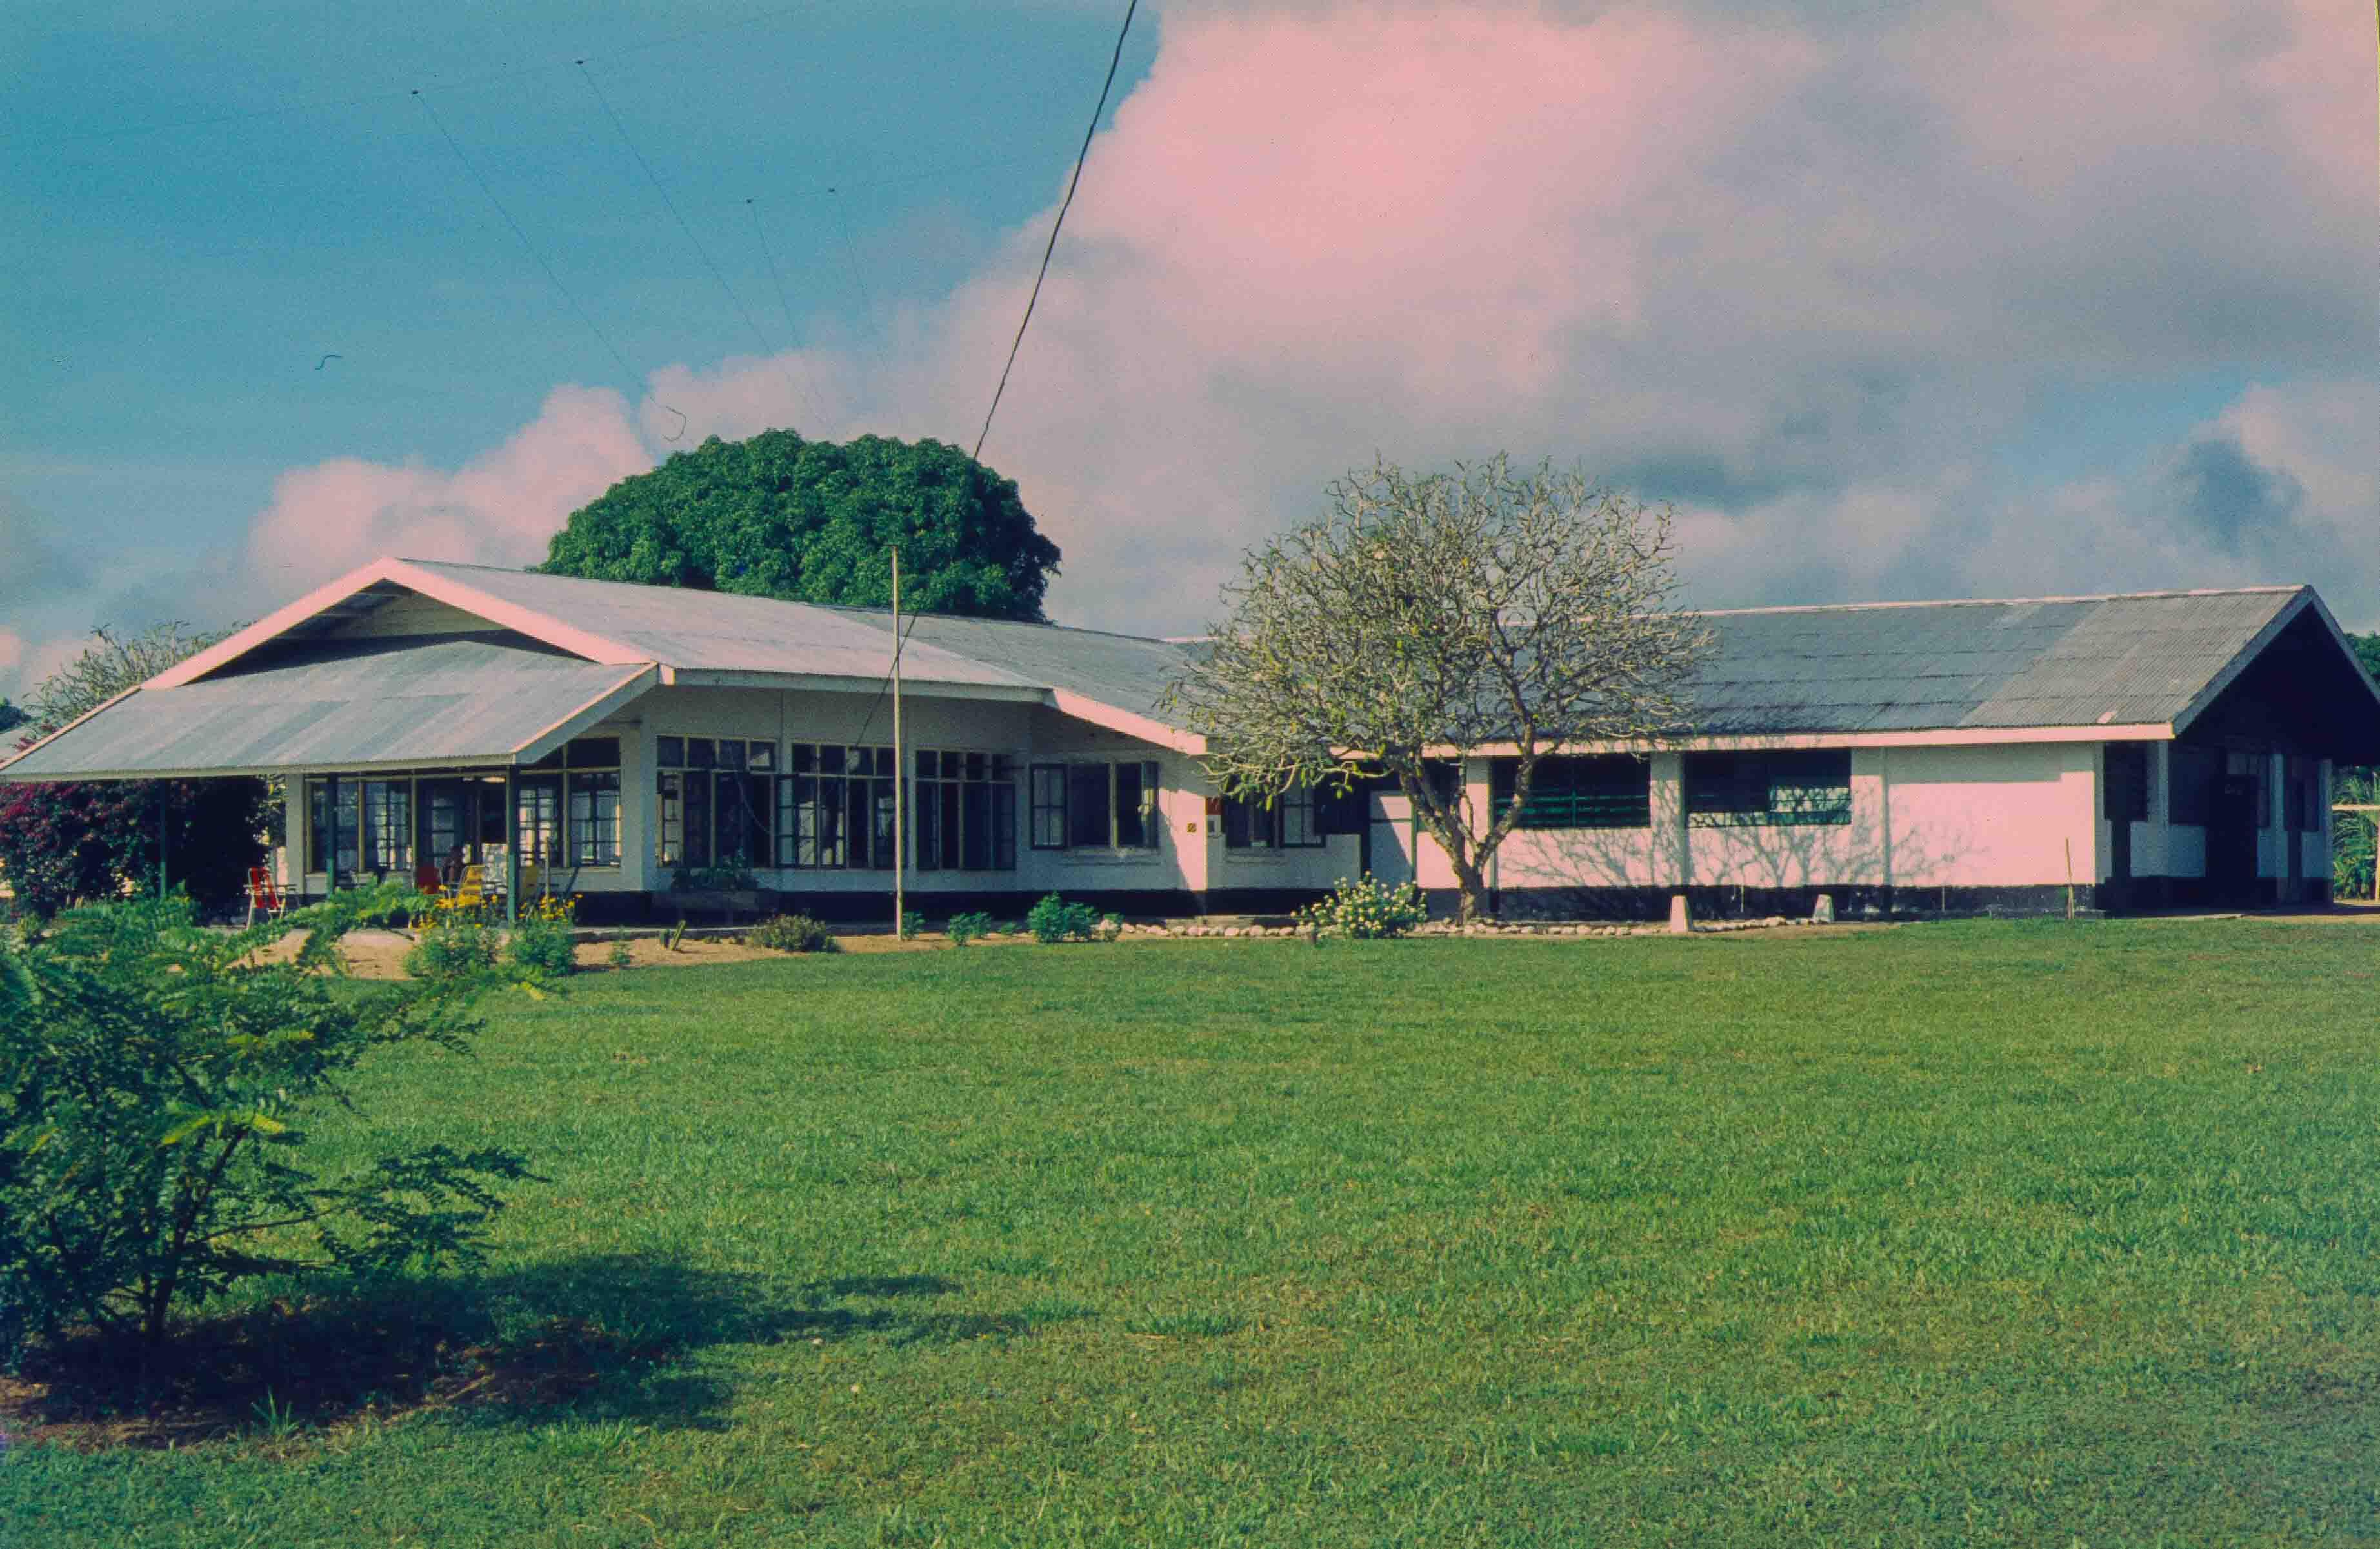 371. Suriname